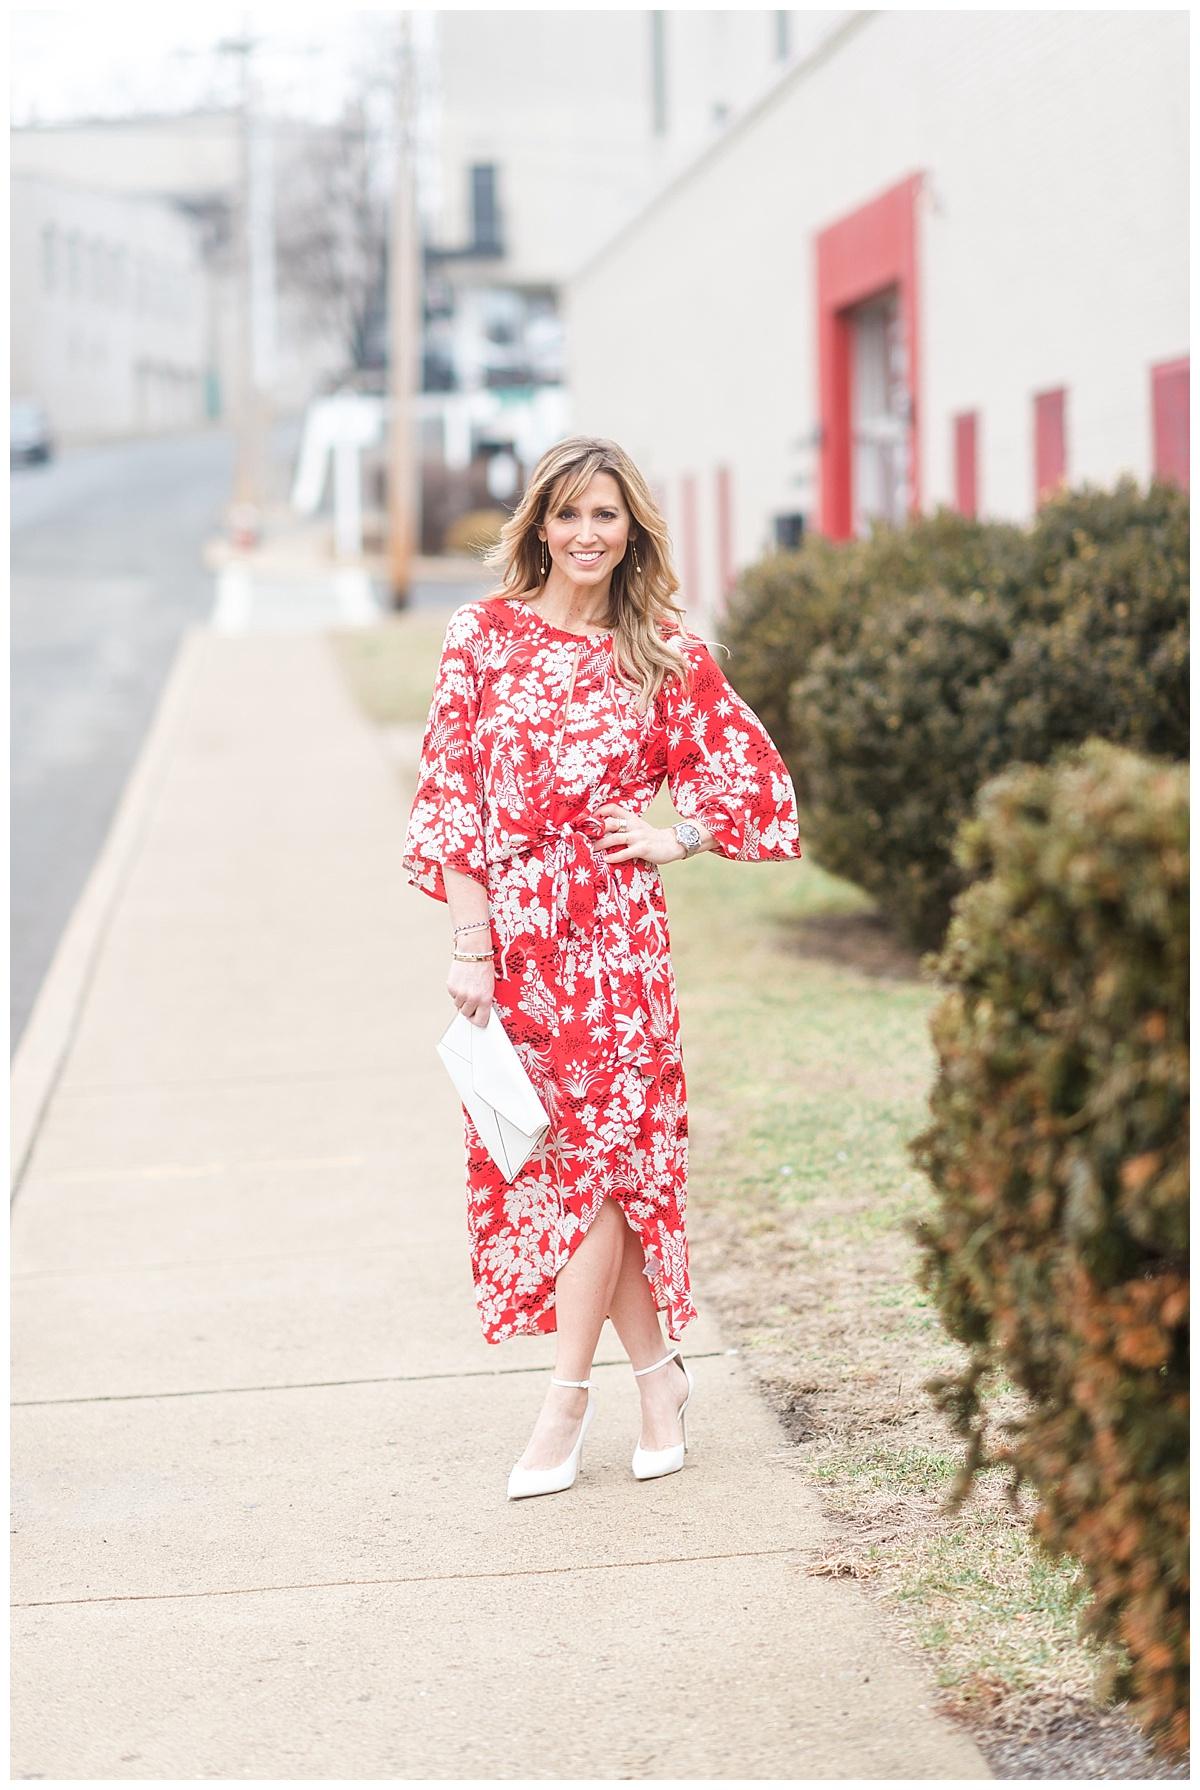 Red floral dress_1097.jpg